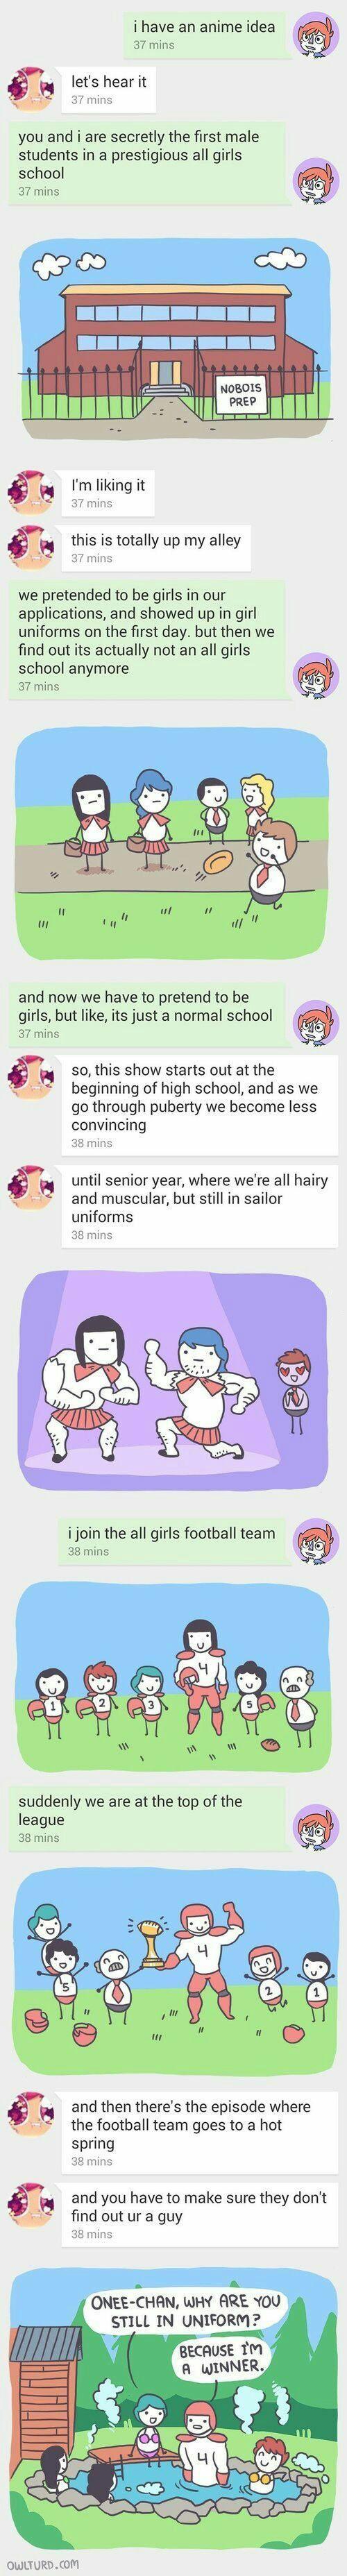 Anime idea